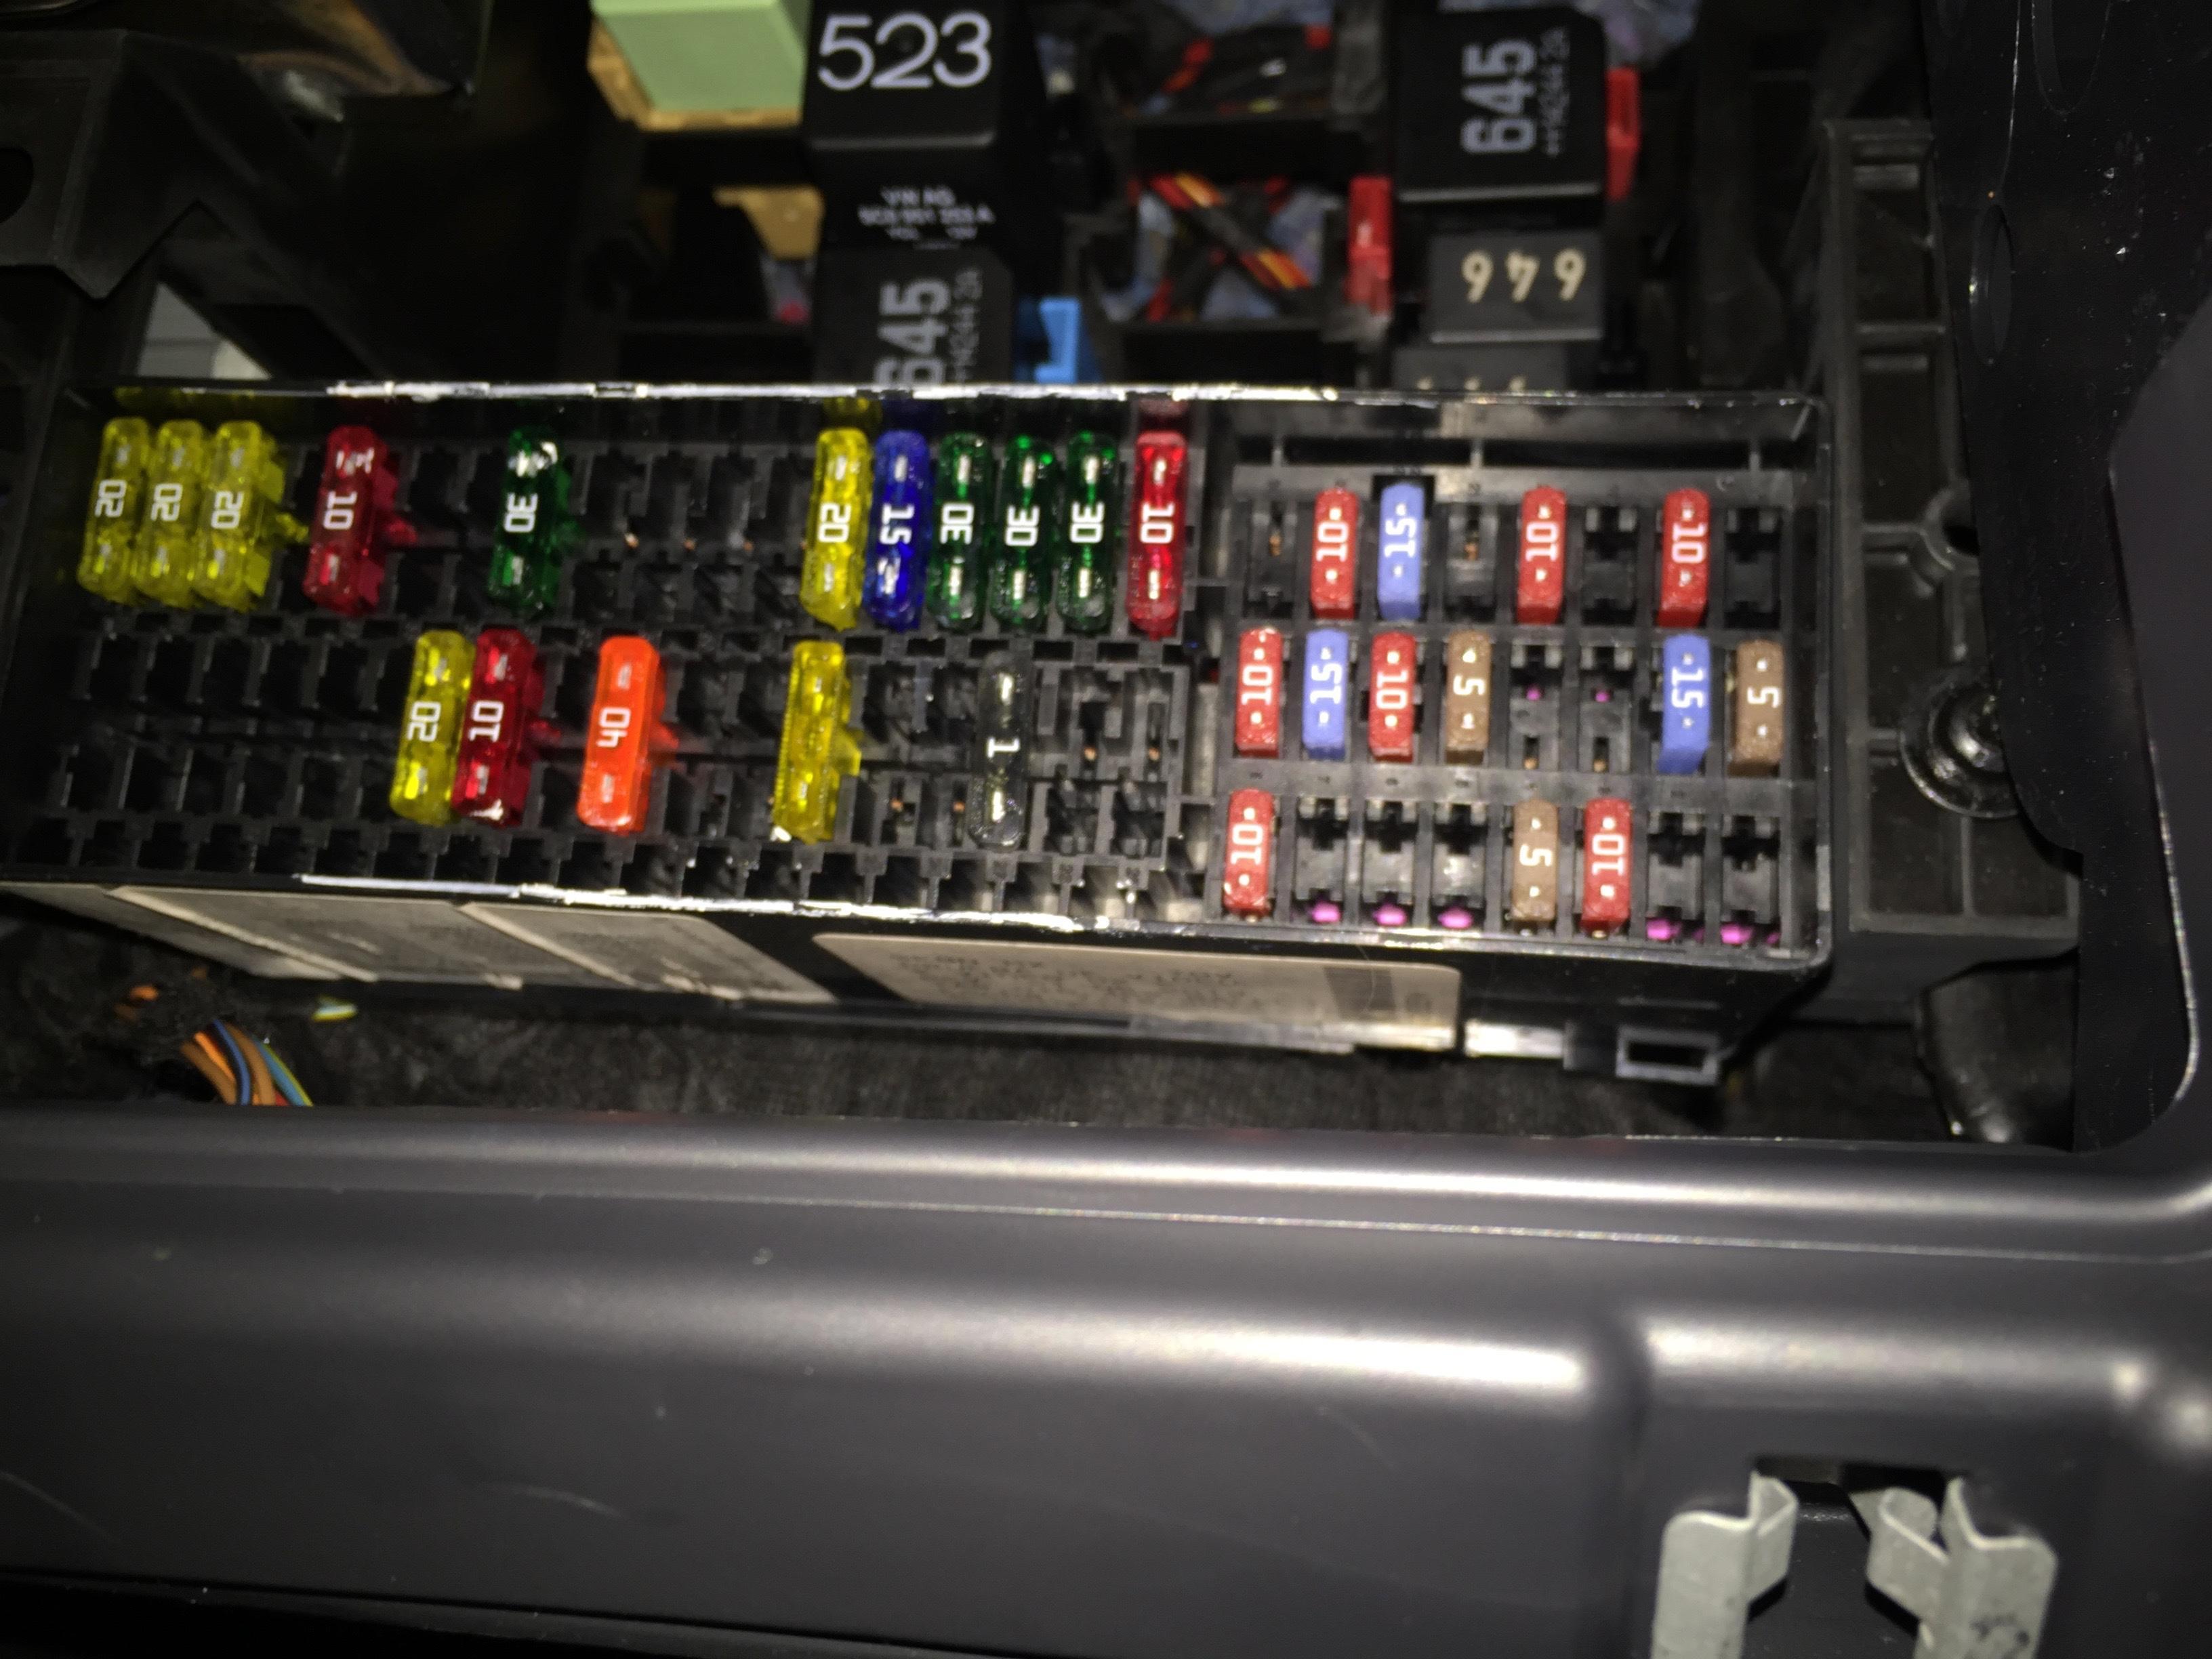 ZO_3022] 2014 Jetta Fuse Box Diagram Cig Lighter Fuse Wiring DiagramMinaga Winn Papxe Mohammedshrine Librar Wiring 101